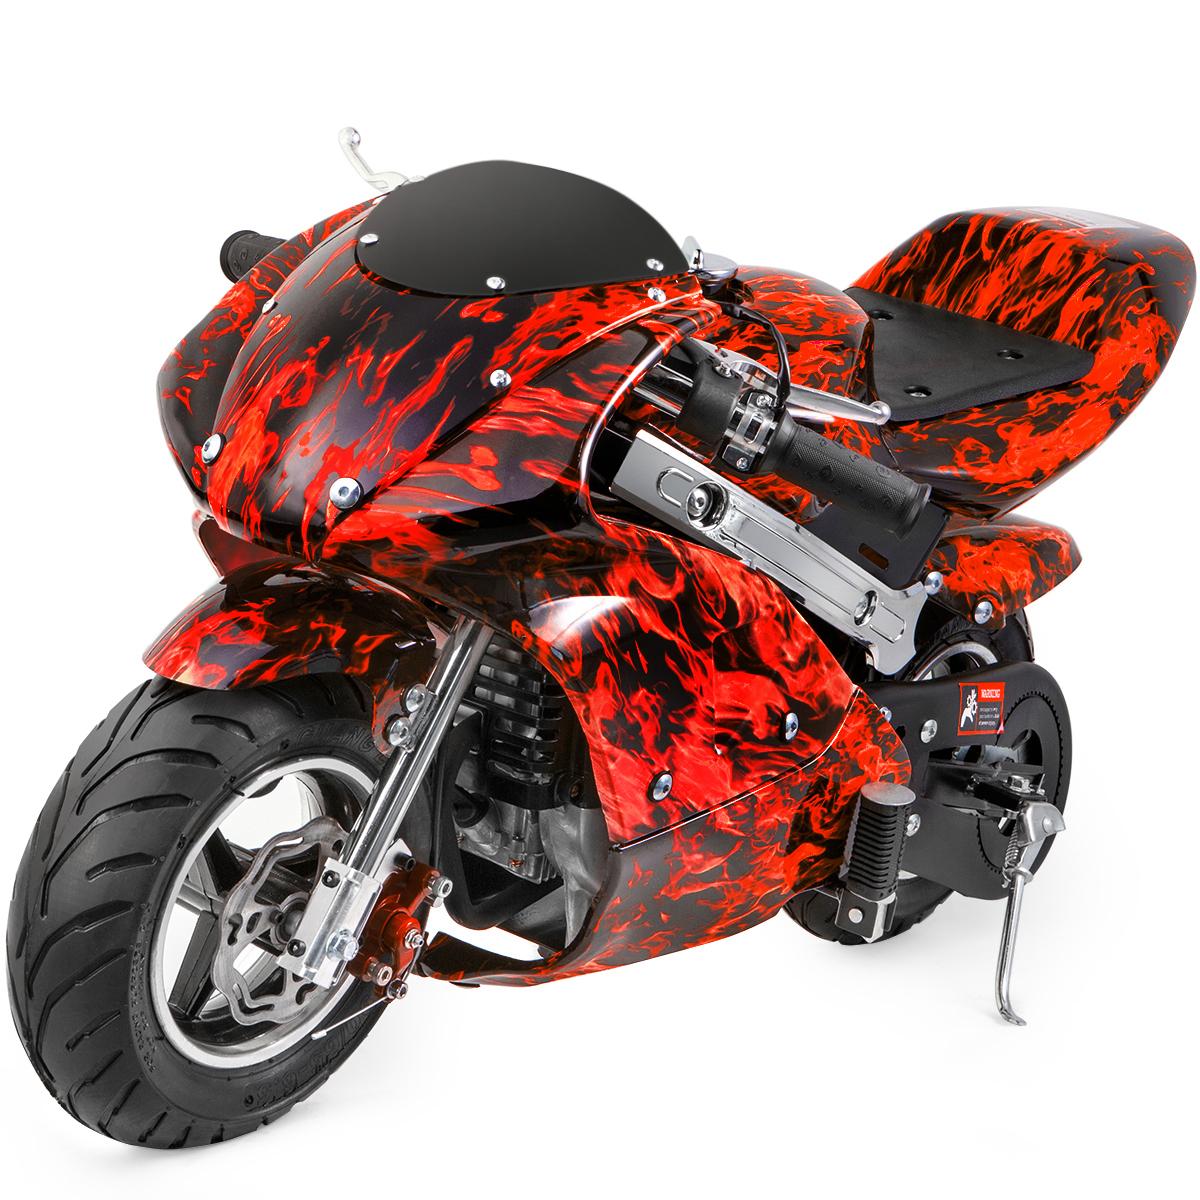 Mini Pocket Bike Gas 40cc Motorcycle 4 Stroke Engine Epa Motor Red Flame 715050831992 Ebay